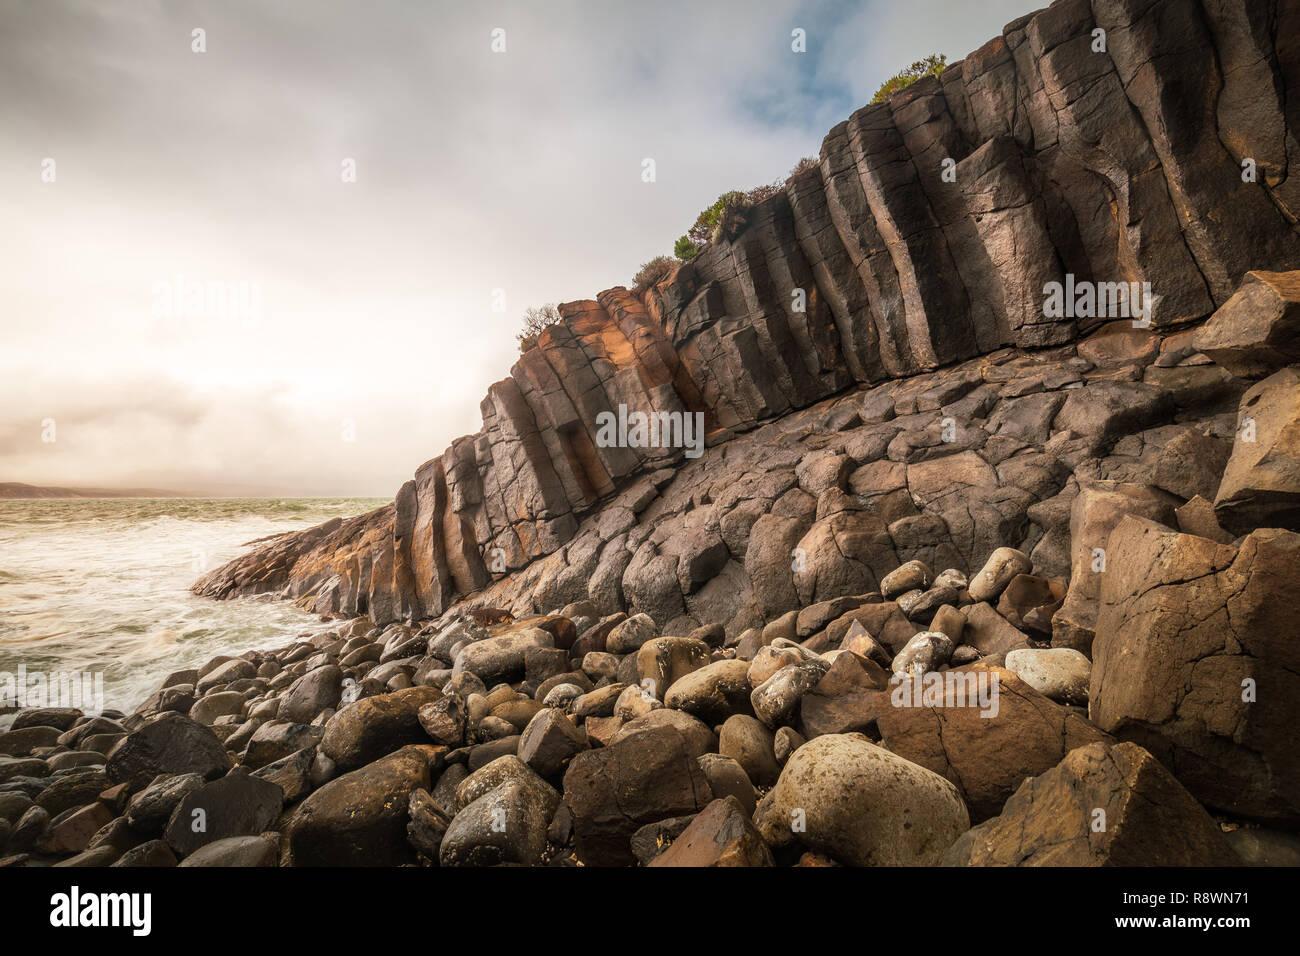 Basalt Seascape, Blackpoint, Western Australia - Stock Image